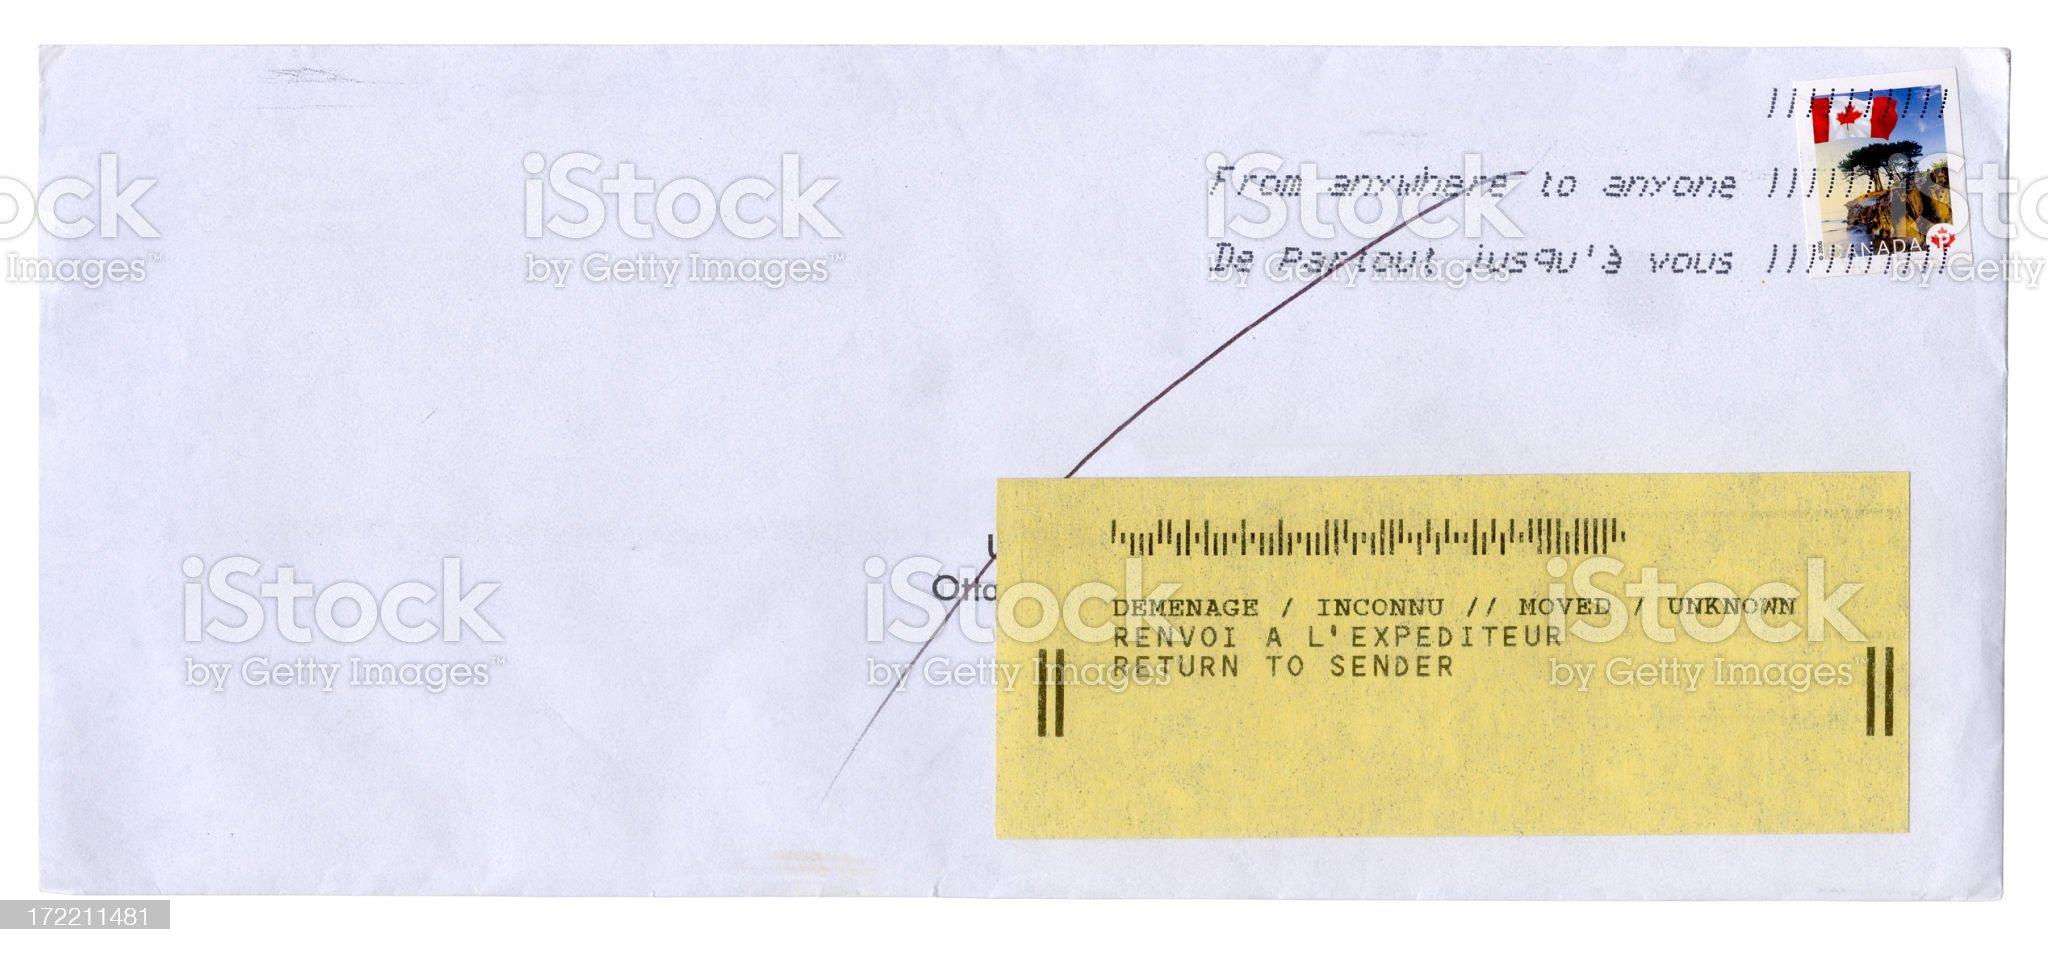 Return to sender letter royalty-free stock photo